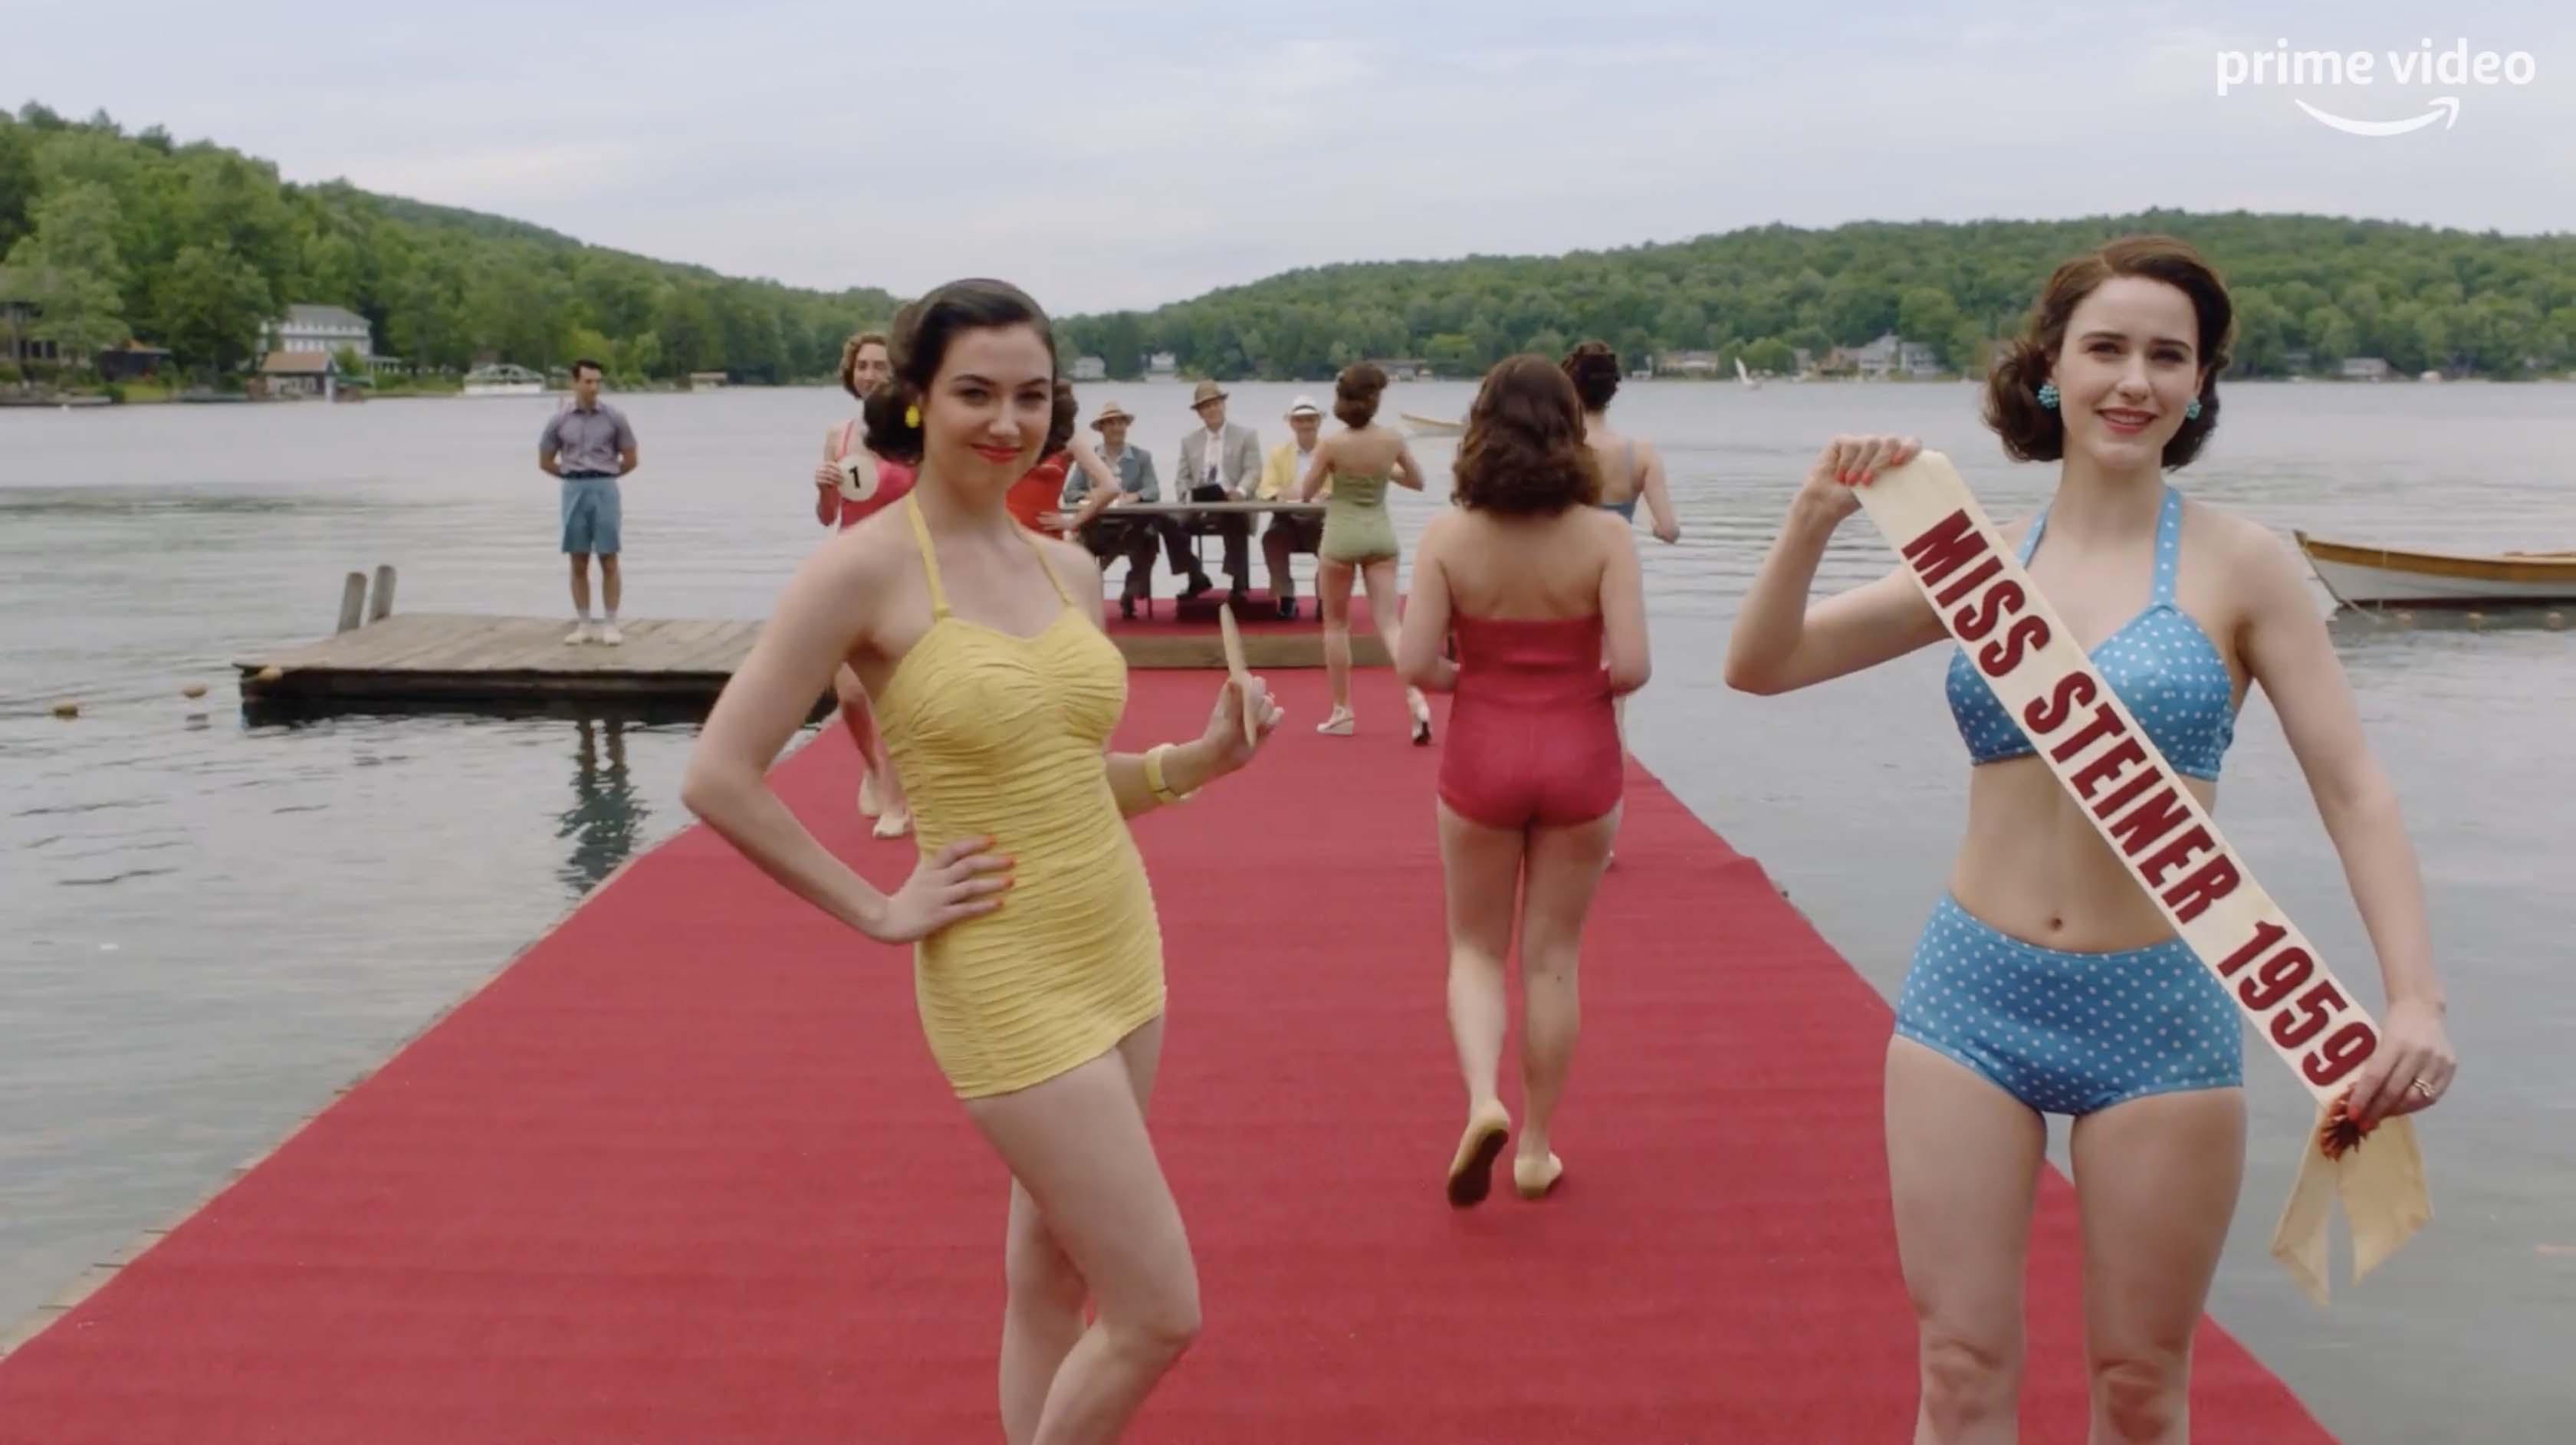 Marvelous Mrs. Maisel Season 2 Trailer - Midge is Going to ... - photo#48